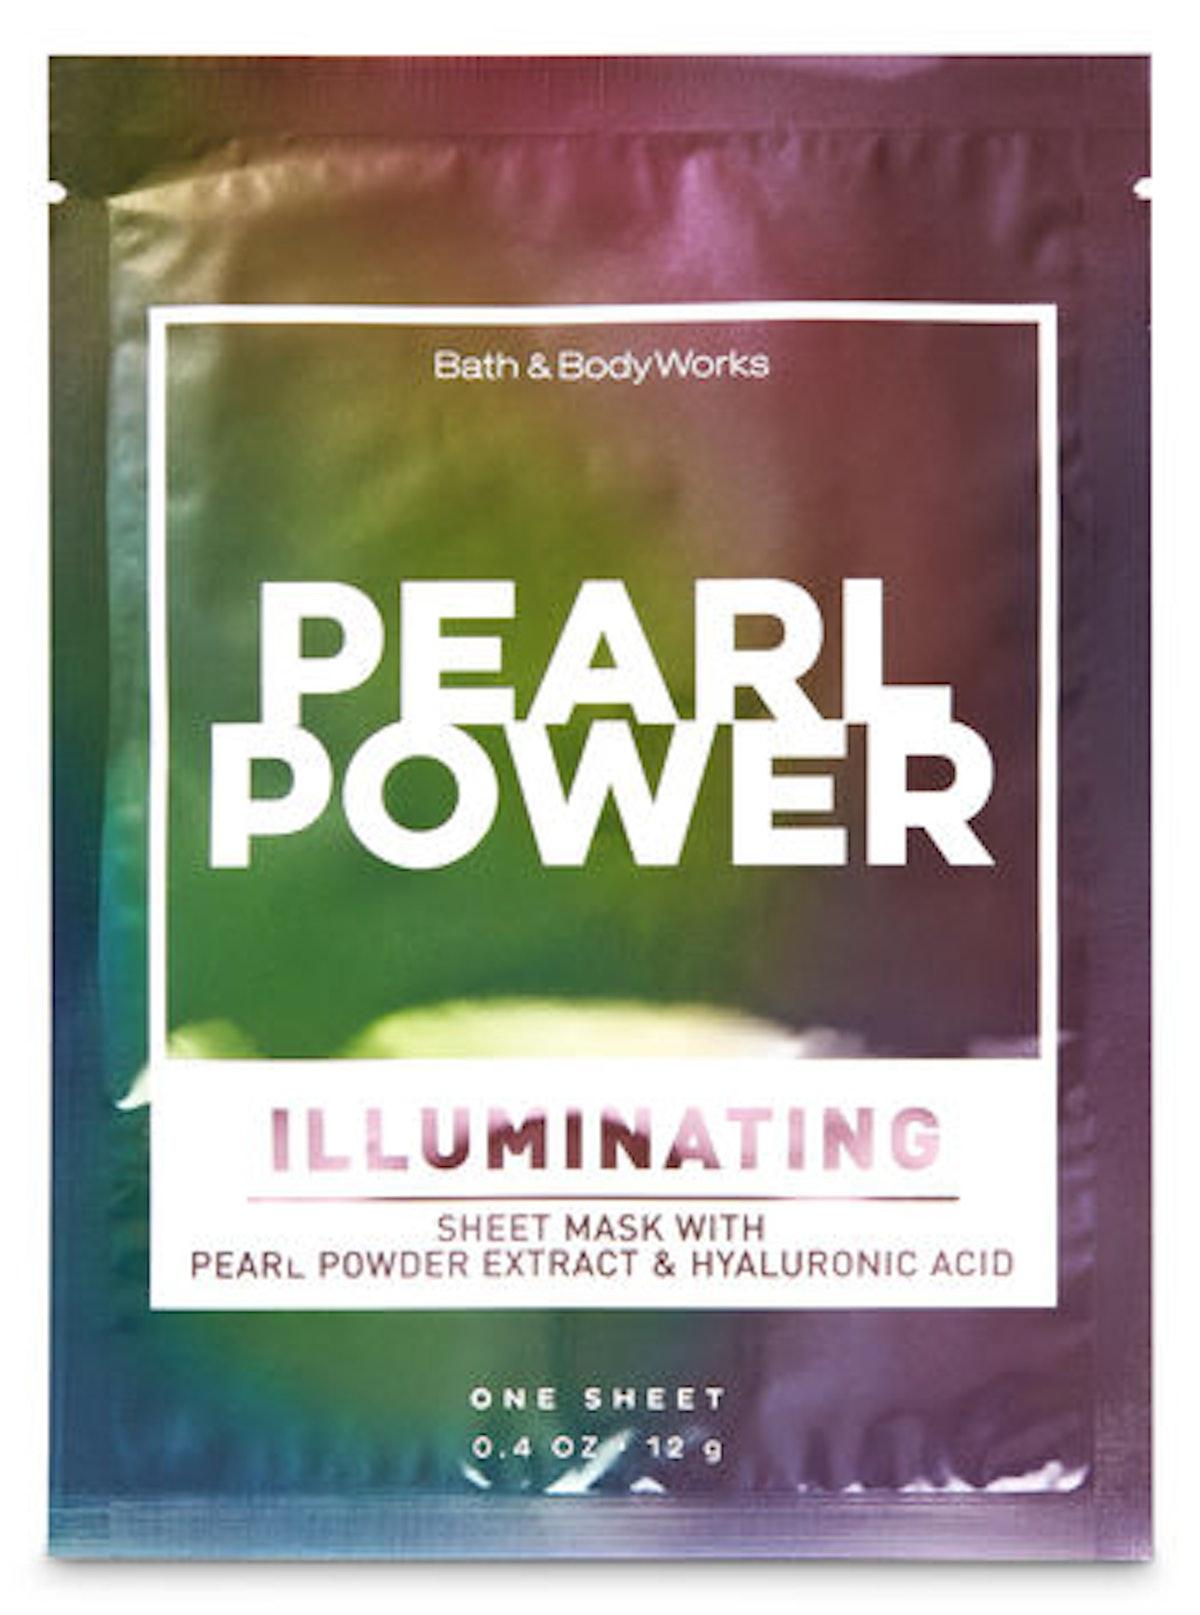 Pearl Power Illuminating Sheet Mask